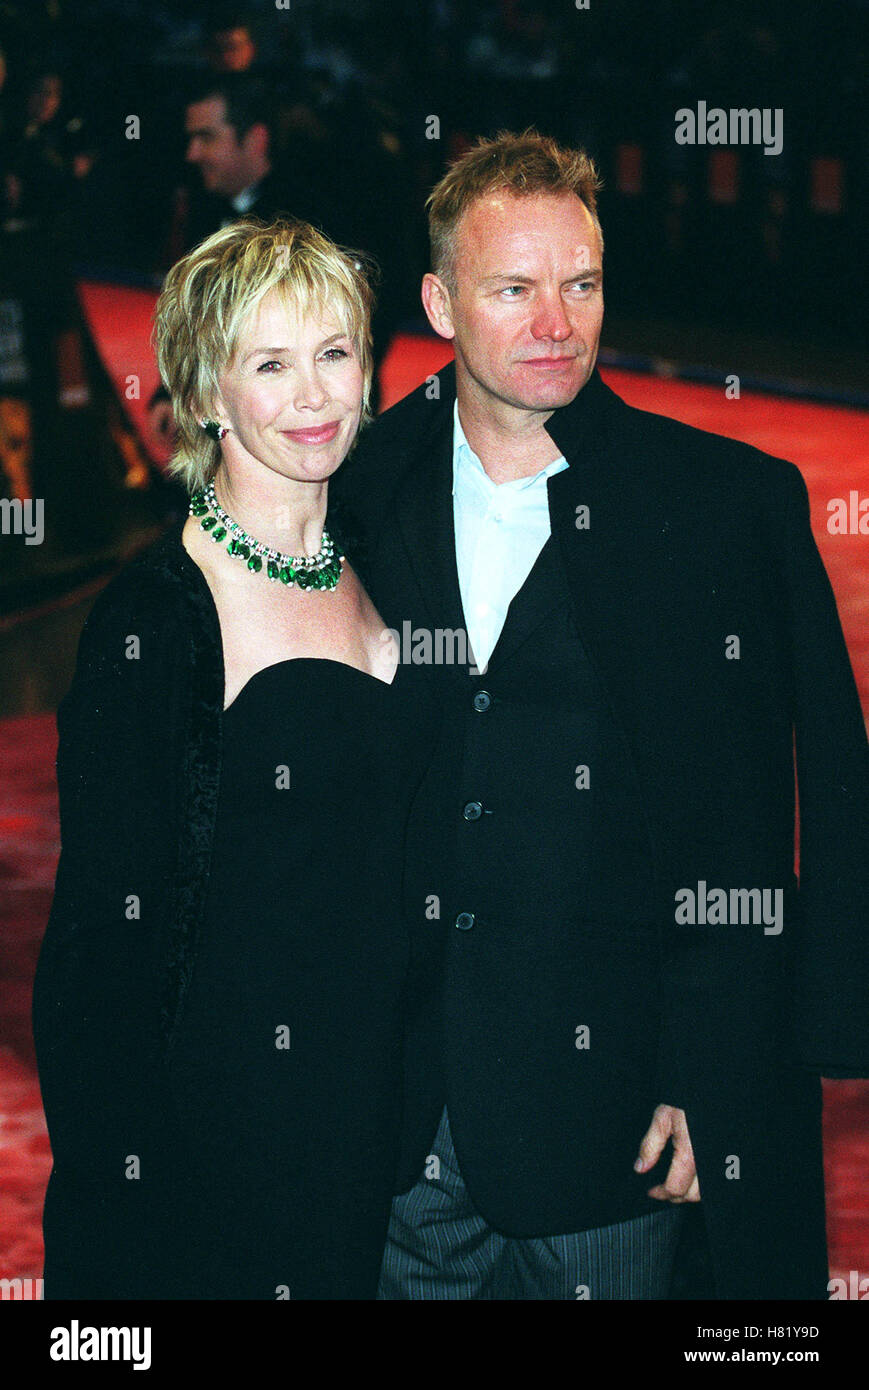 STING & TRUDIE STYLER BAFTA FILM AWARDS BAFTA FILM AWARDS LONDON ENGLAND 24. Februar 2002 Stockfoto